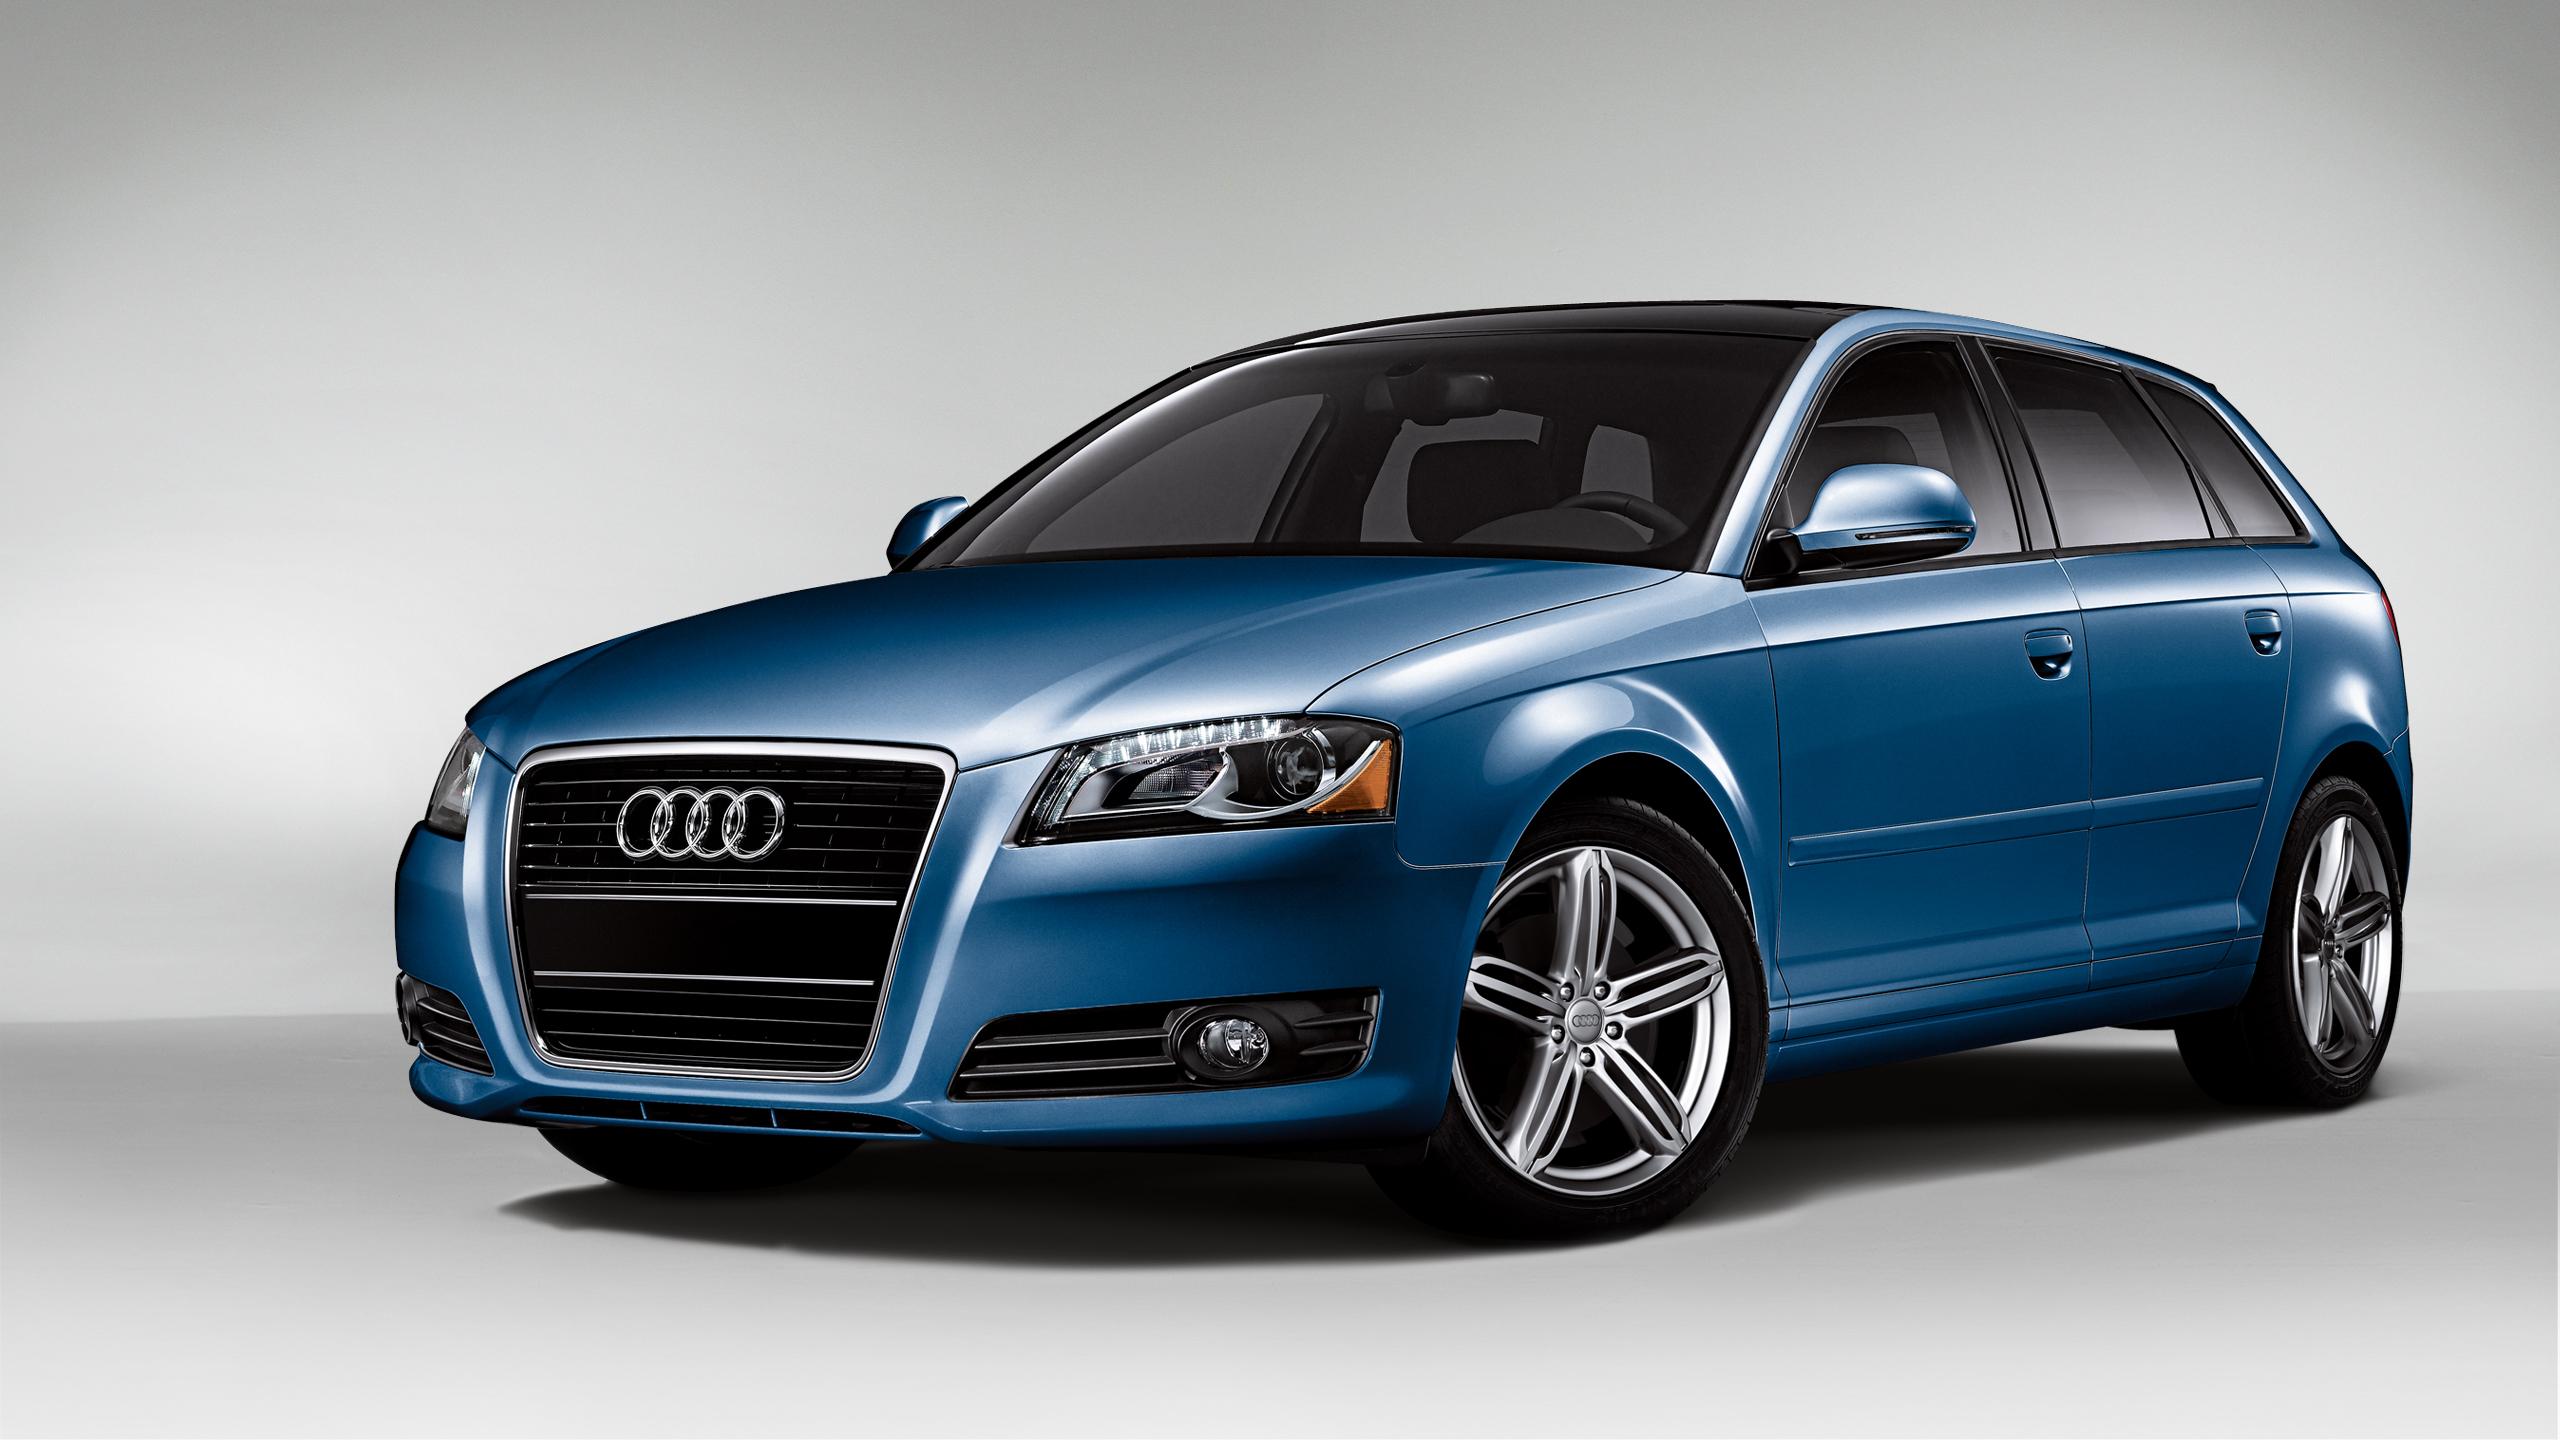 AUDI A3 blue